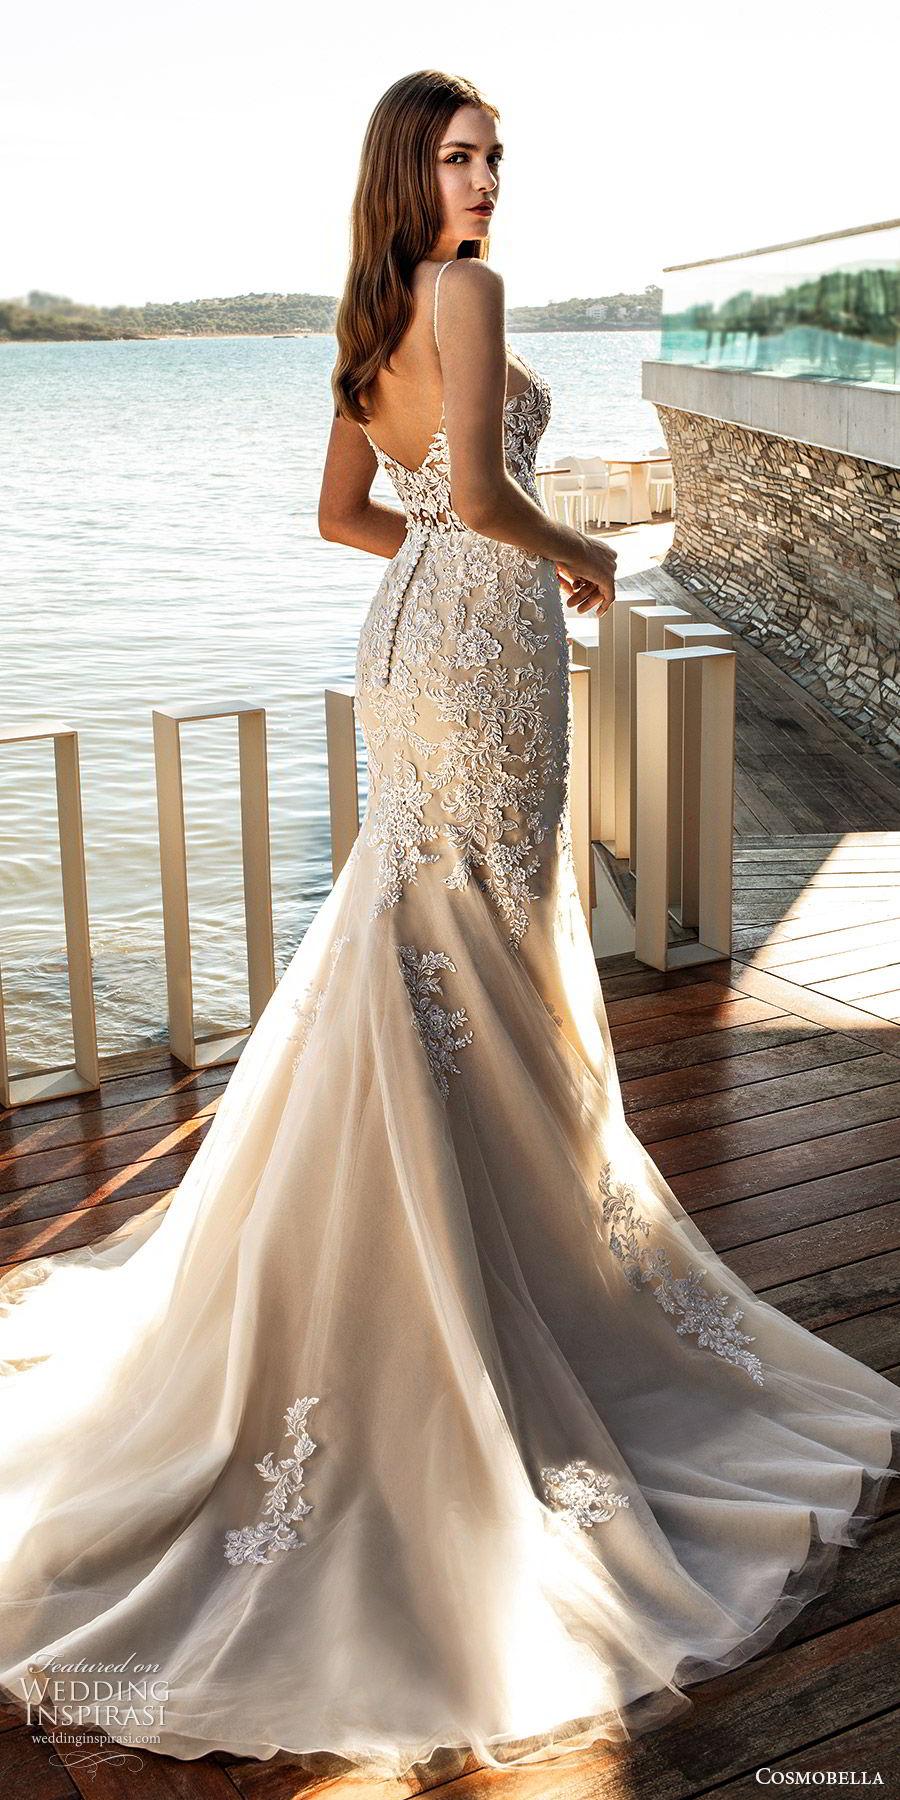 cosmobella 2020 bridal sleeveless thin straps sweetheart sheer bodice fully embellished lace trumpet fit flare wedding dress (4) champagne elegant romantic chapel train bv